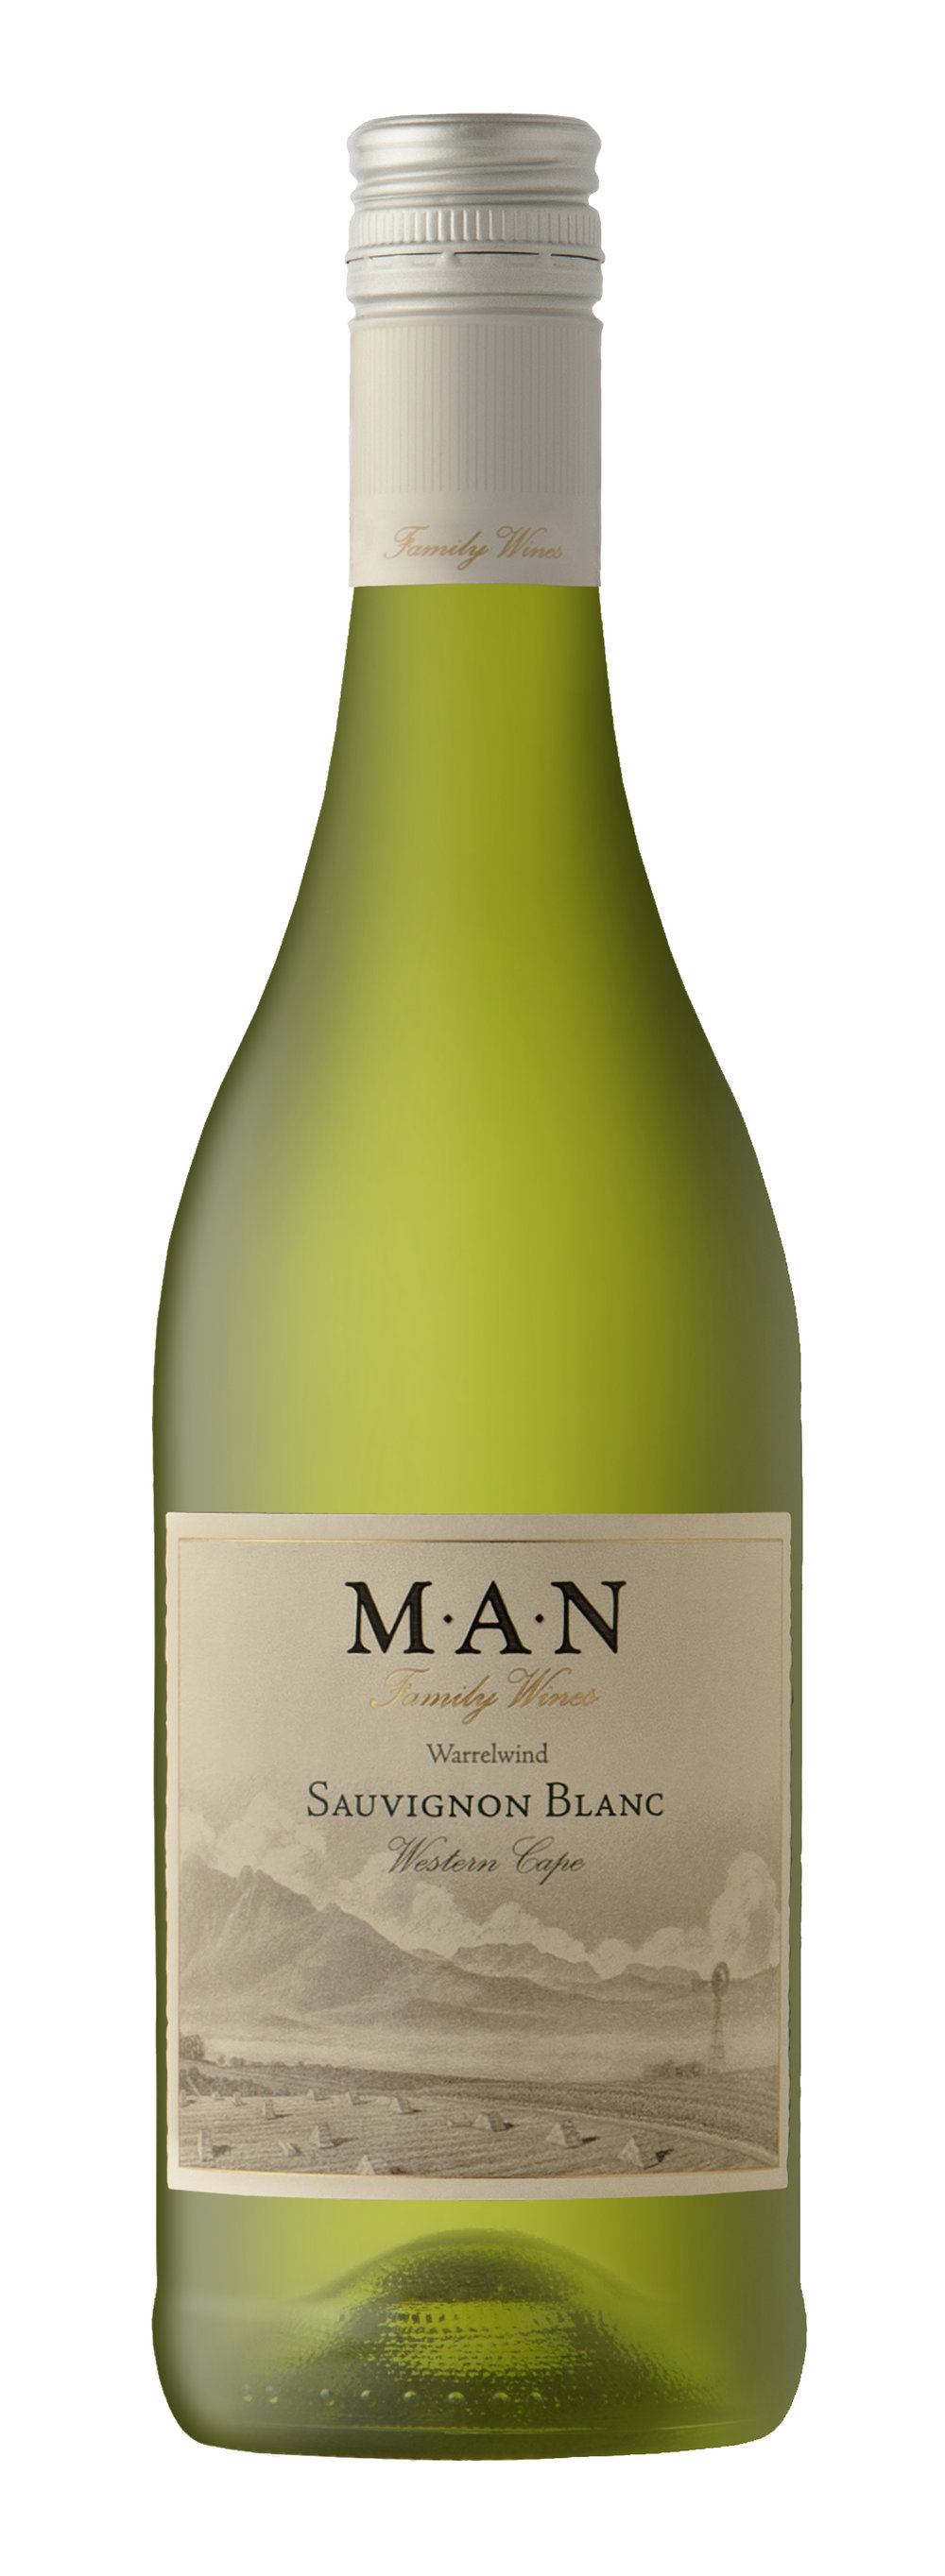 MAN Family Wines Sauvignon Blanc Bottle (NEW).jpg